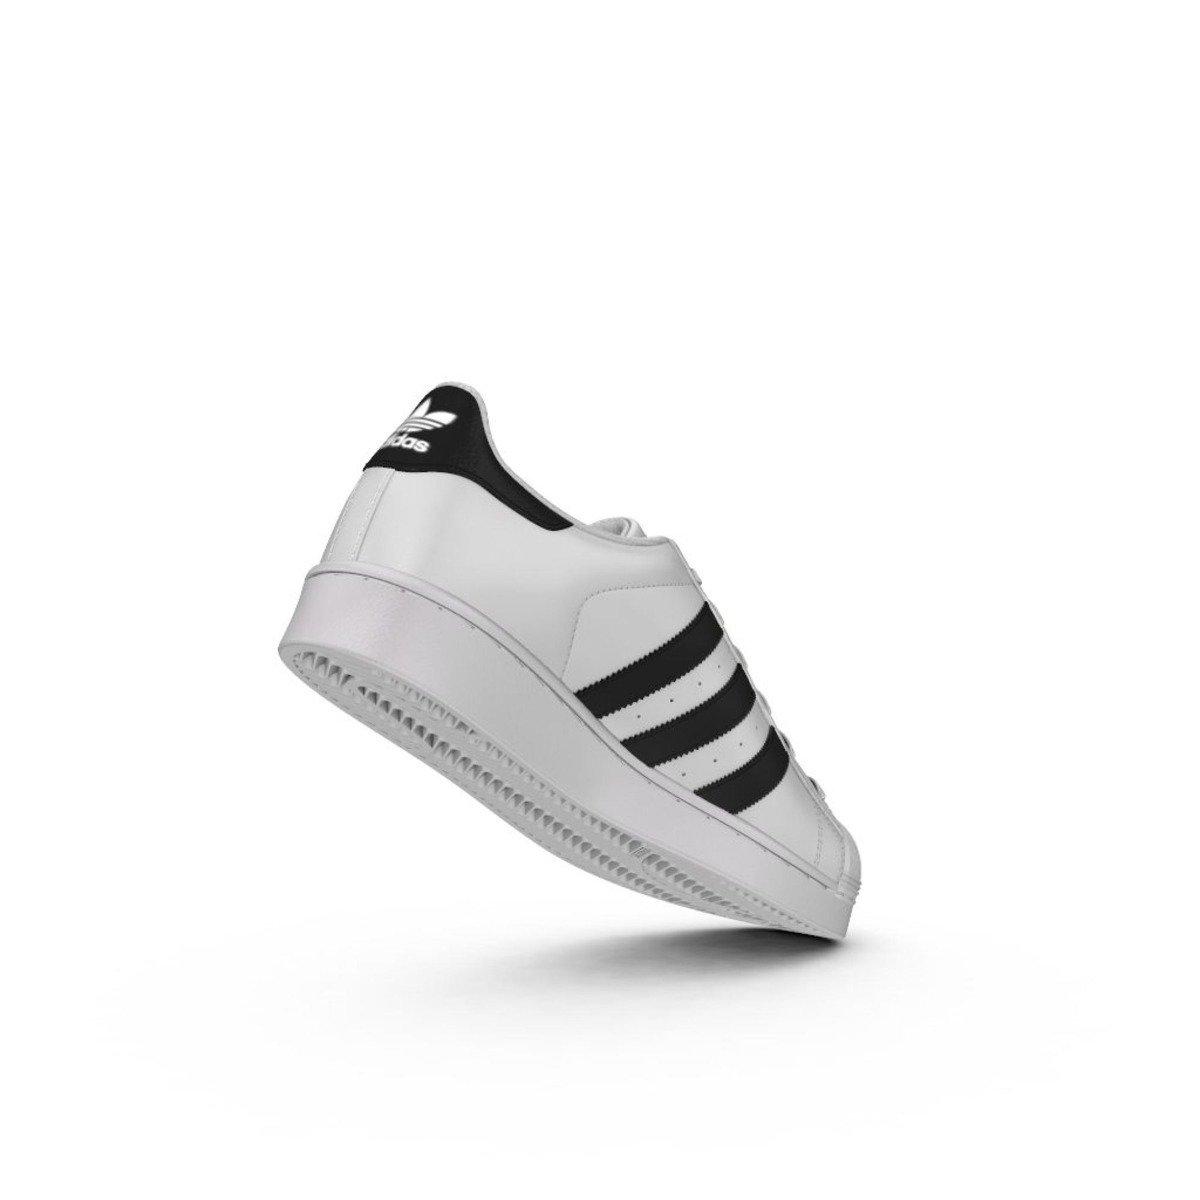 Adidas Originals Junior Foundation Chaussures Superstar C77154 PiOkuZXwT